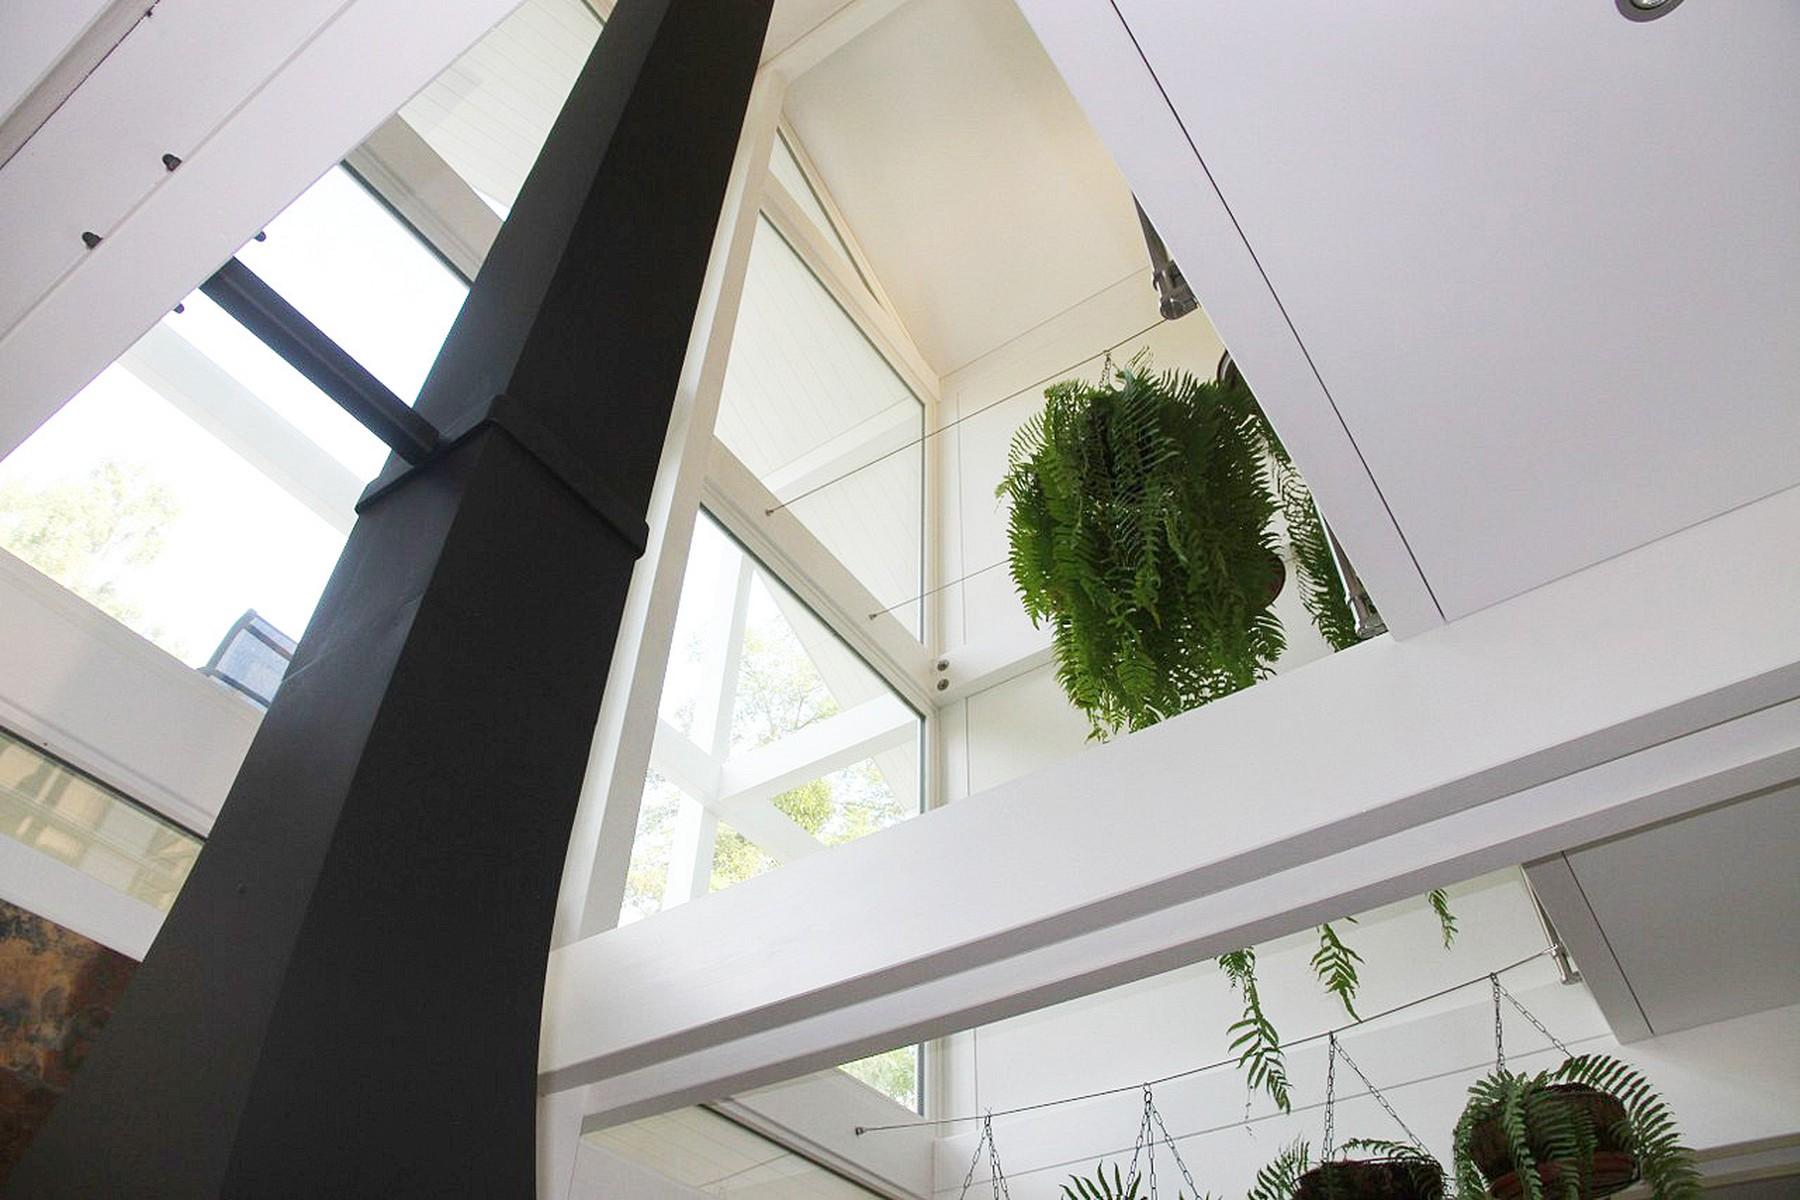 modernes fachwerkhaus architektenhaus hell holz skelett konstruktion 9 concentus moderne. Black Bedroom Furniture Sets. Home Design Ideas